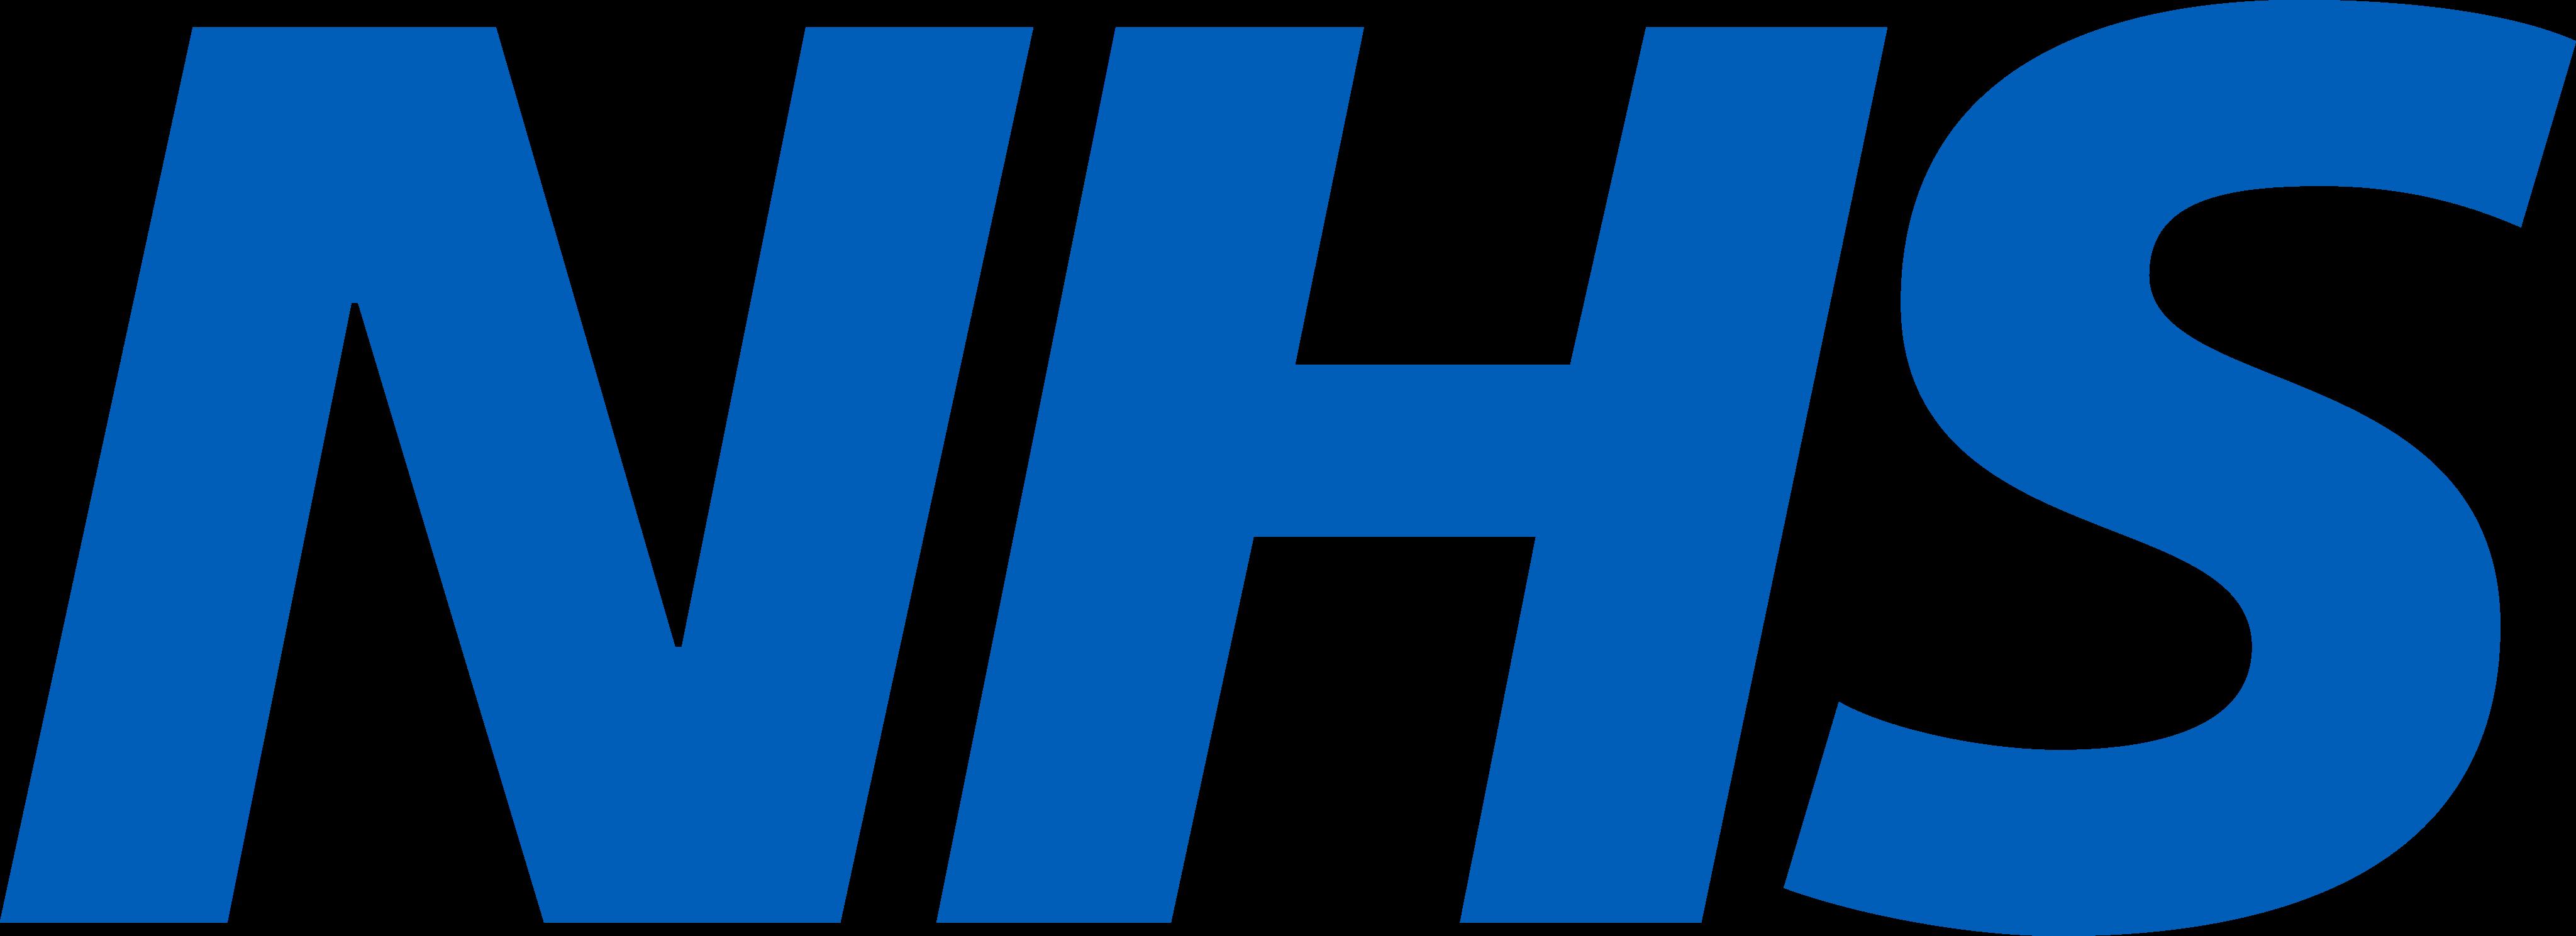 nhs logo 1 - NHS Logo - National Health Service Logo